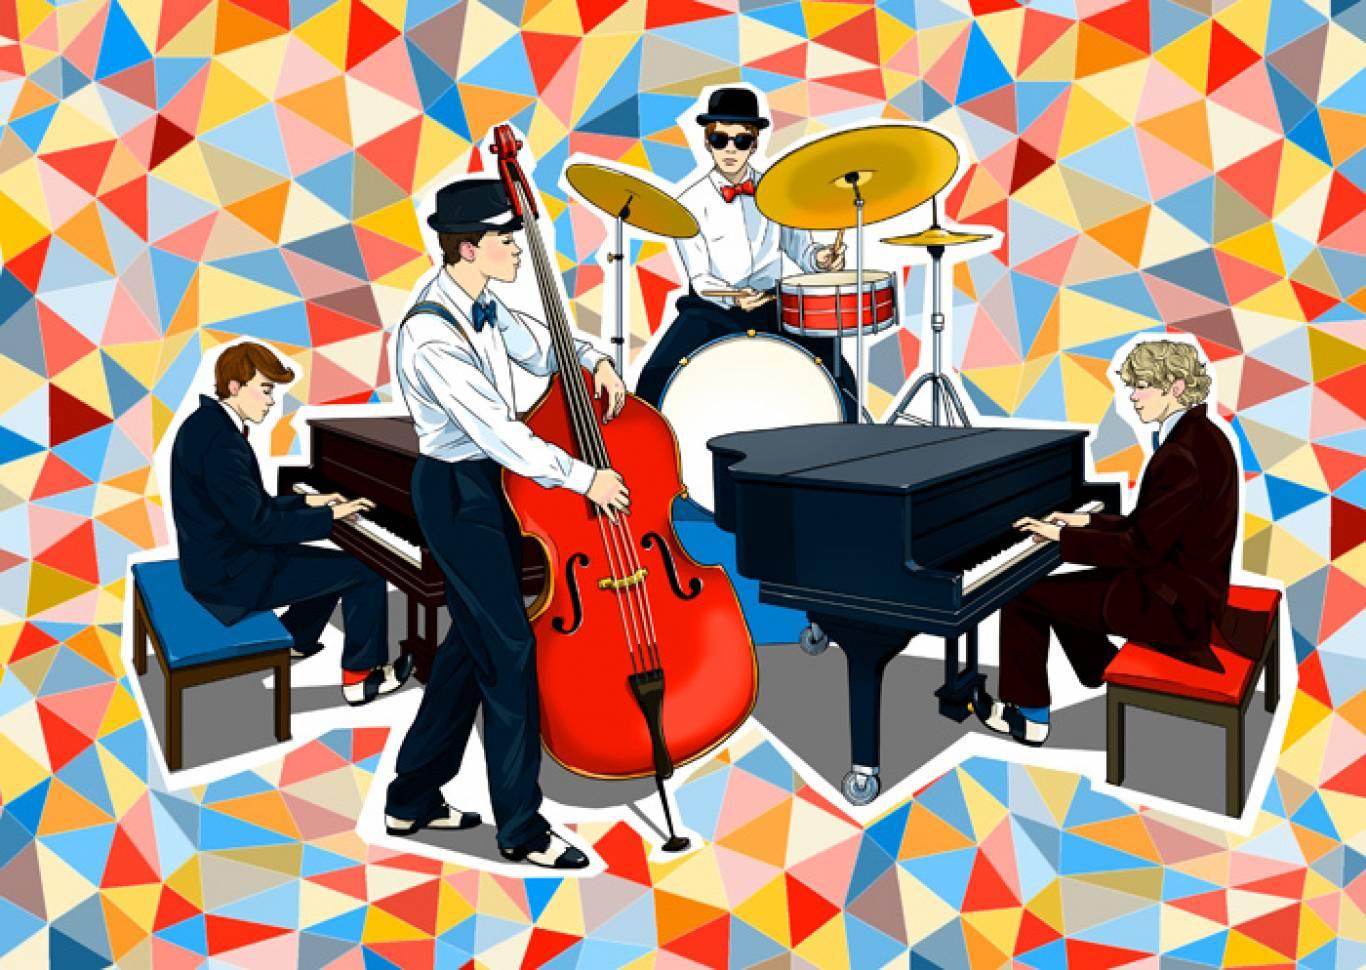 Музыкальная открытка группа, жабы клавы психотерапия